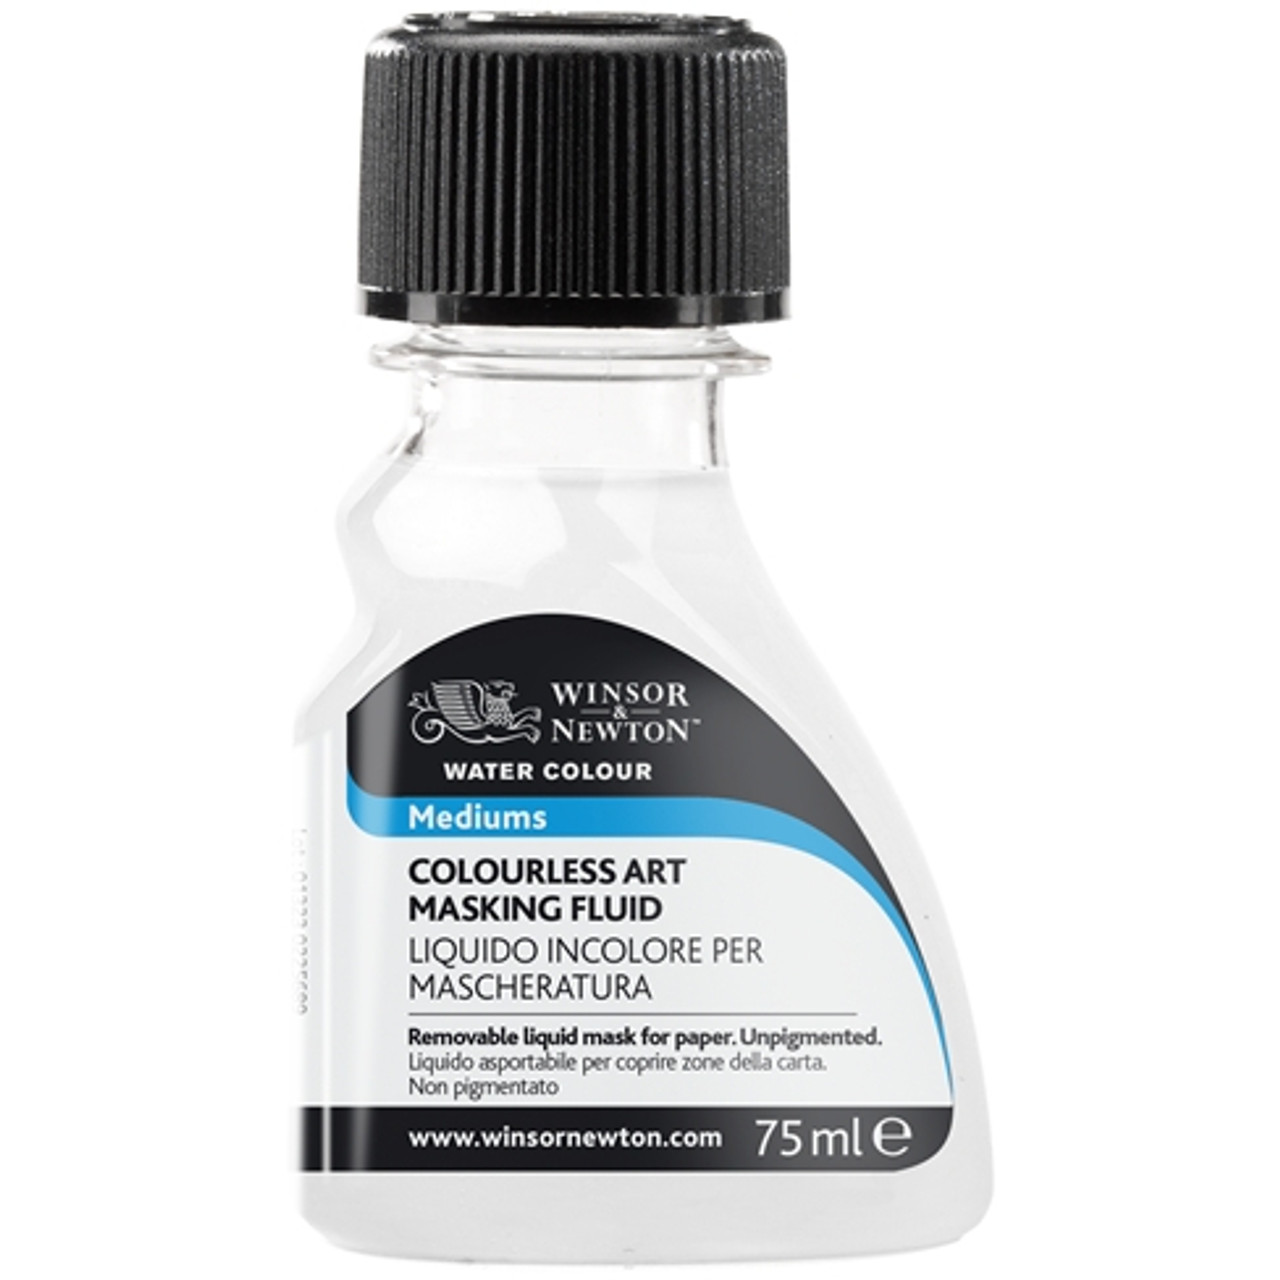 Art Masking Fluid, Colorless, 75ml